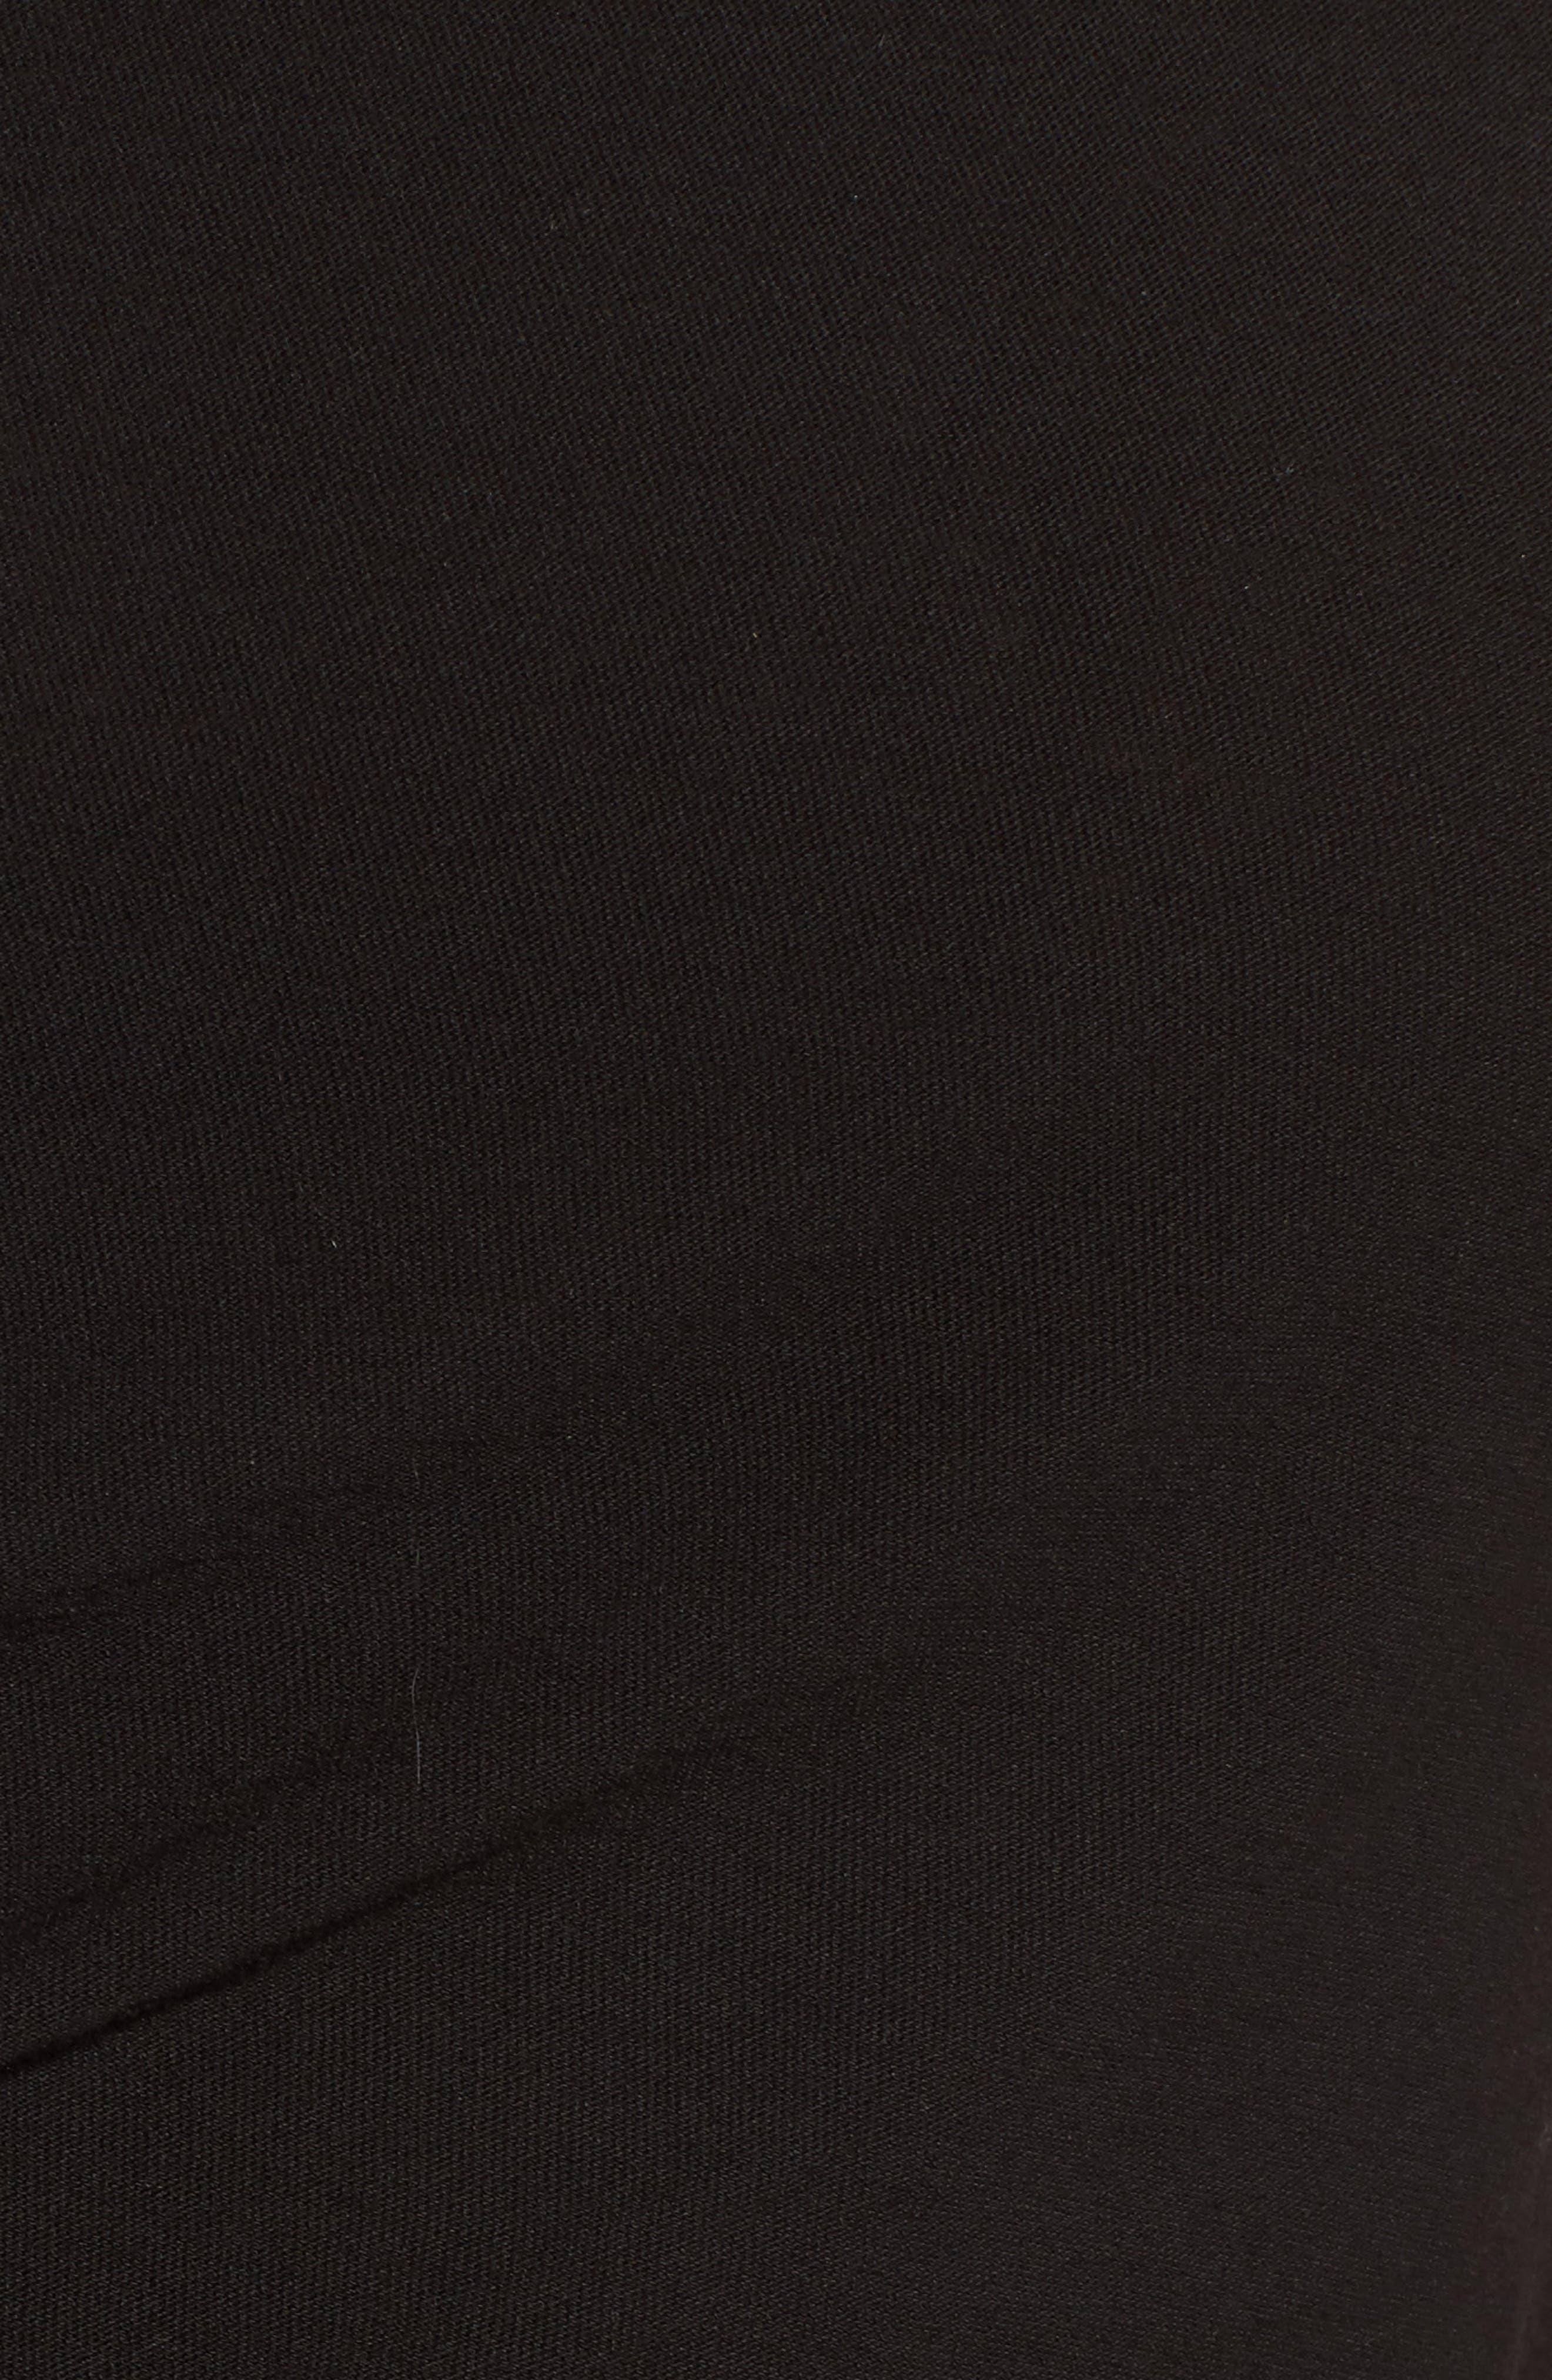 Spiral Shirred Sheath Dress,                             Alternate thumbnail 5, color,                             Black